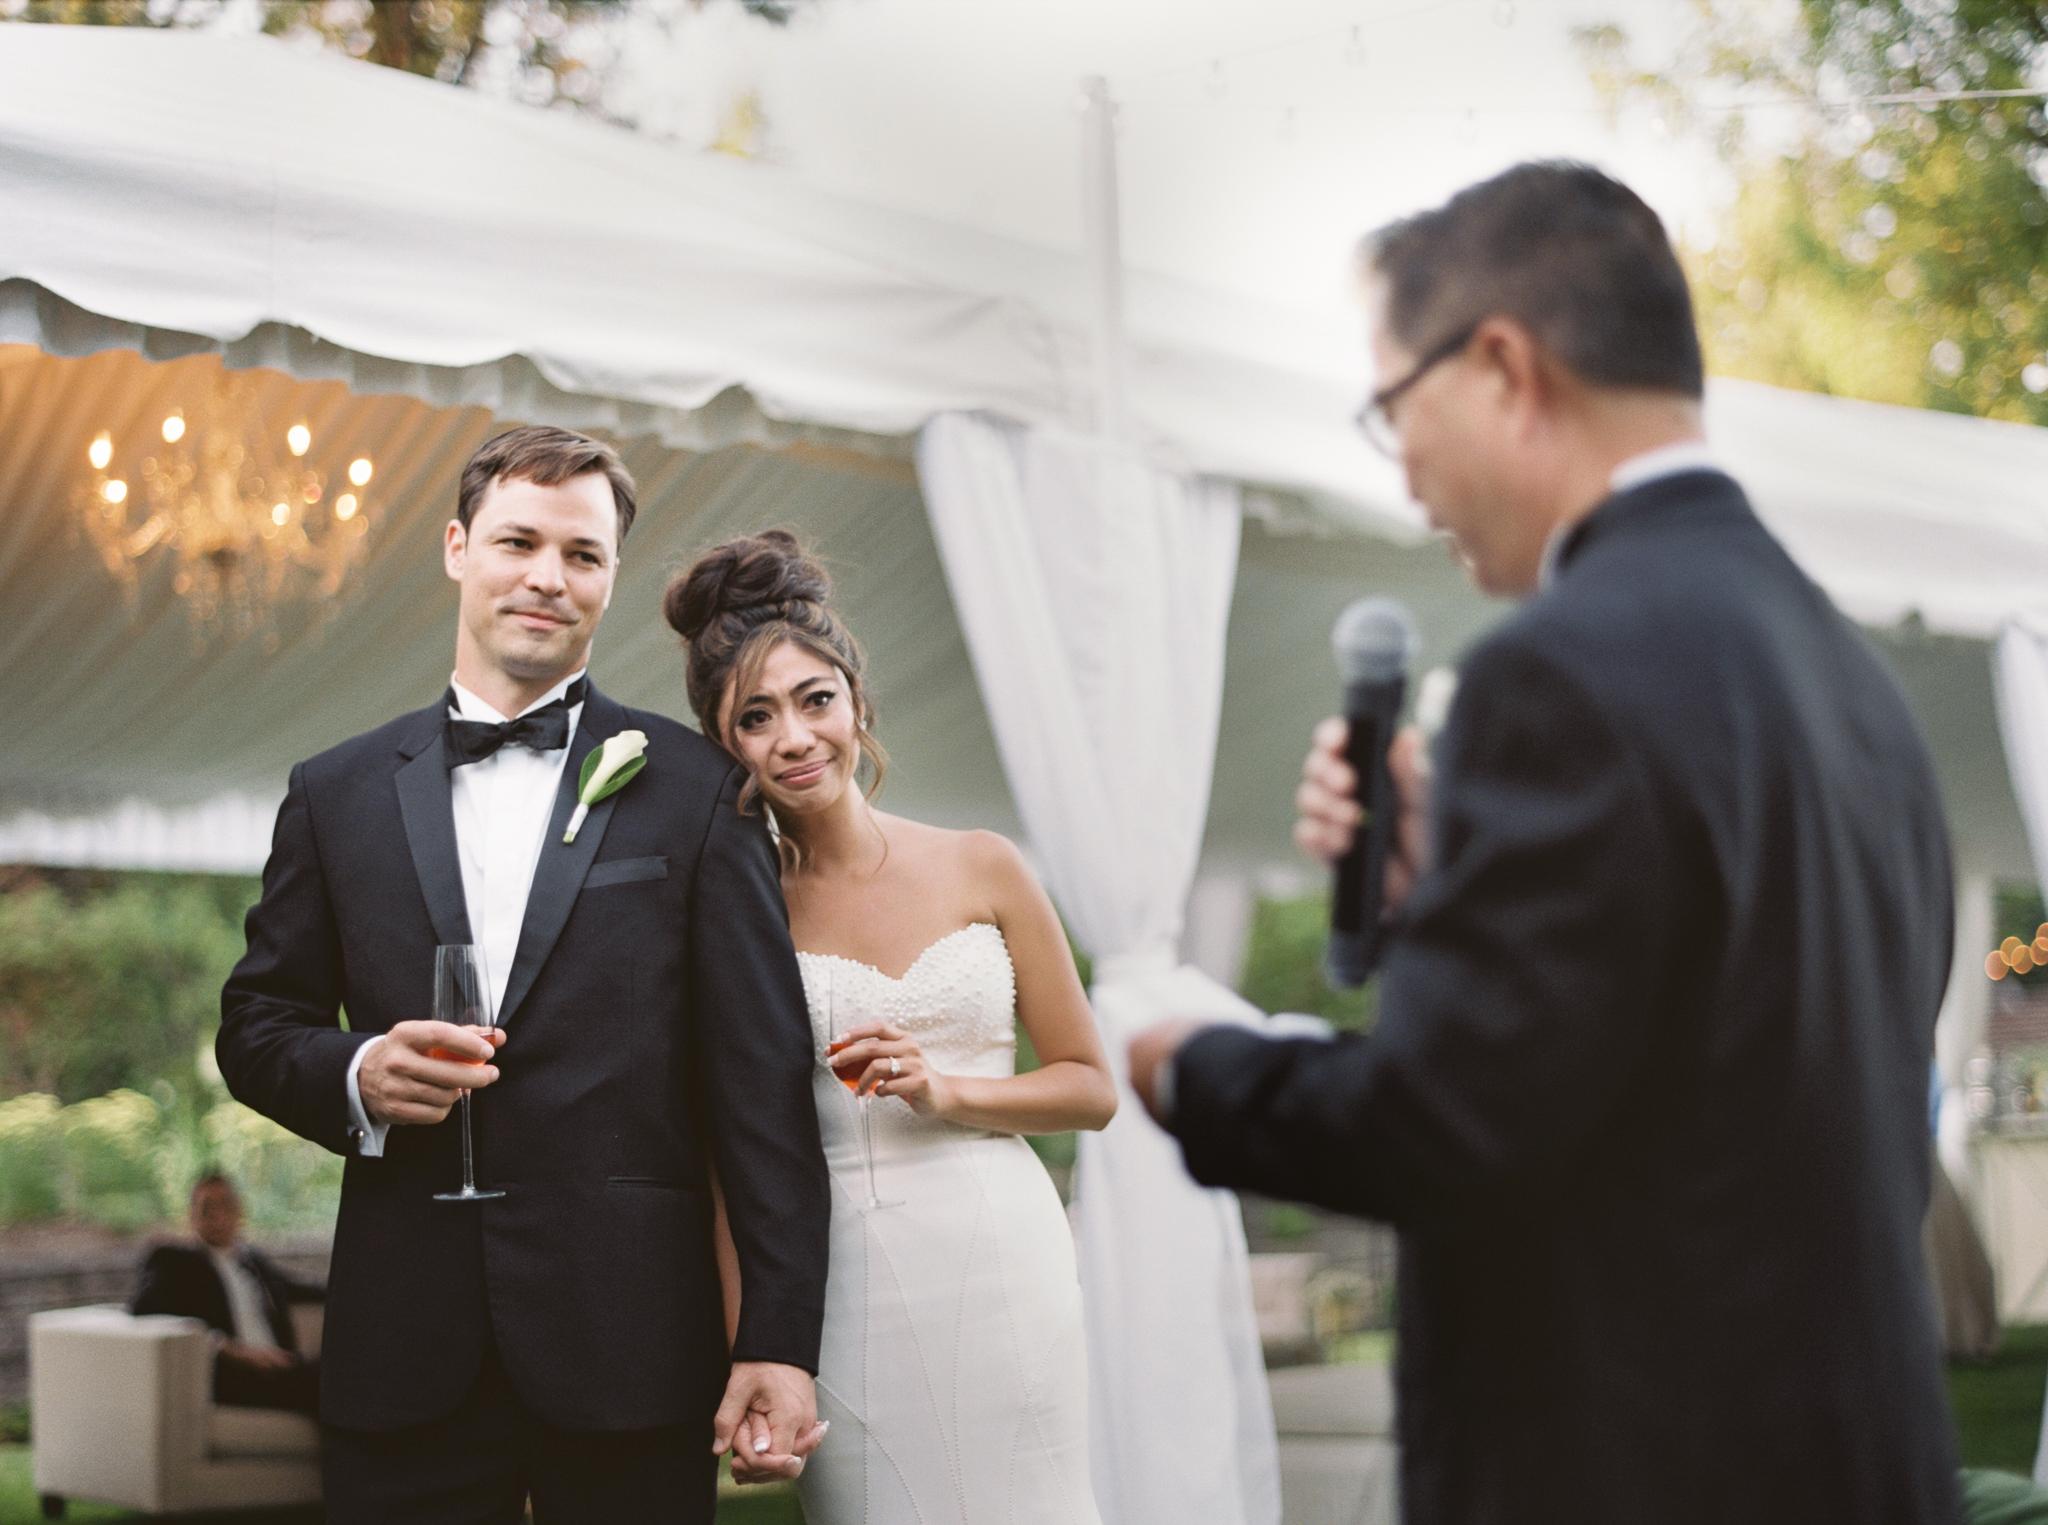 199OutliveCreative_Travel_Photographer_Videographer_Lewis&Clark_Oregon_Elegant_BlackTie_Destination_Wedding.jpg